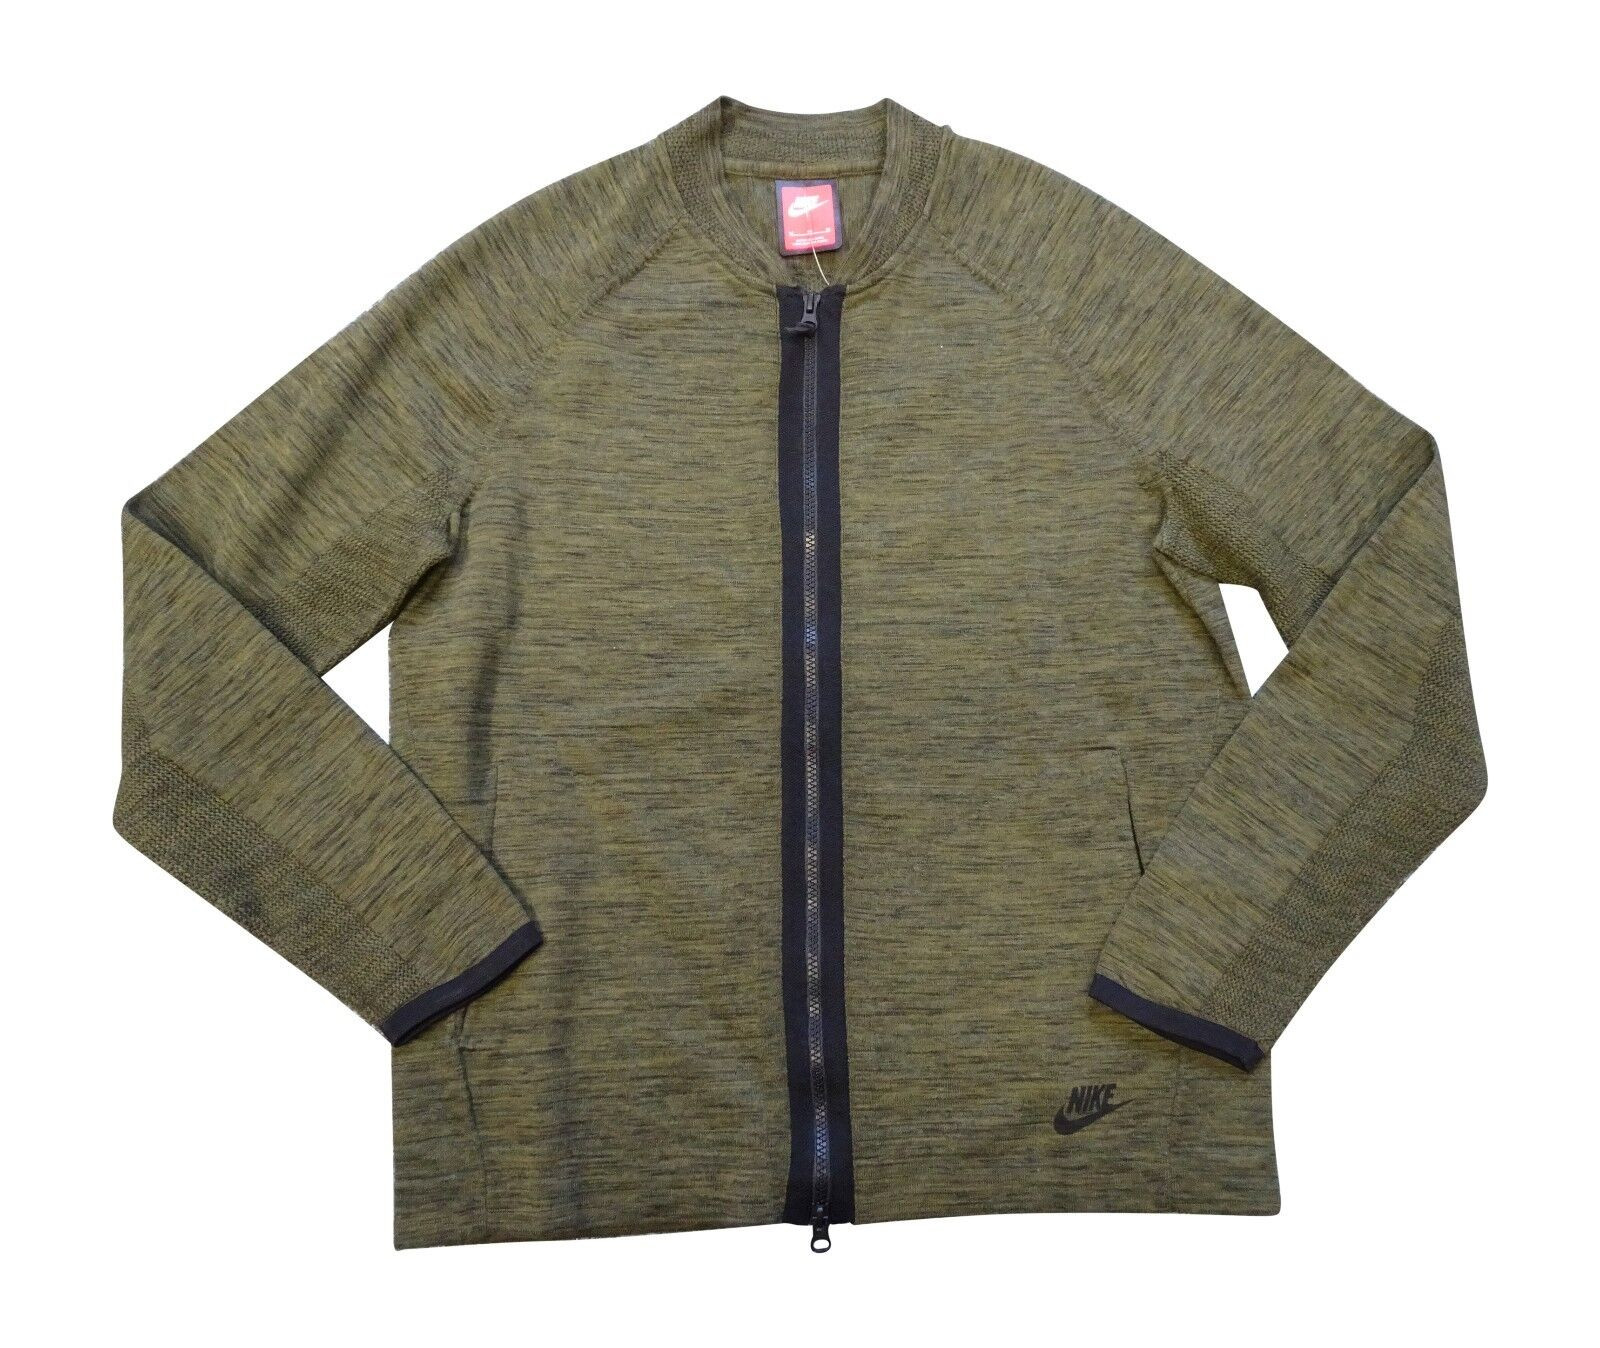 Nike Sportkleidung Herren Tech Strick Bomber Jacke 810558 Pulli 347